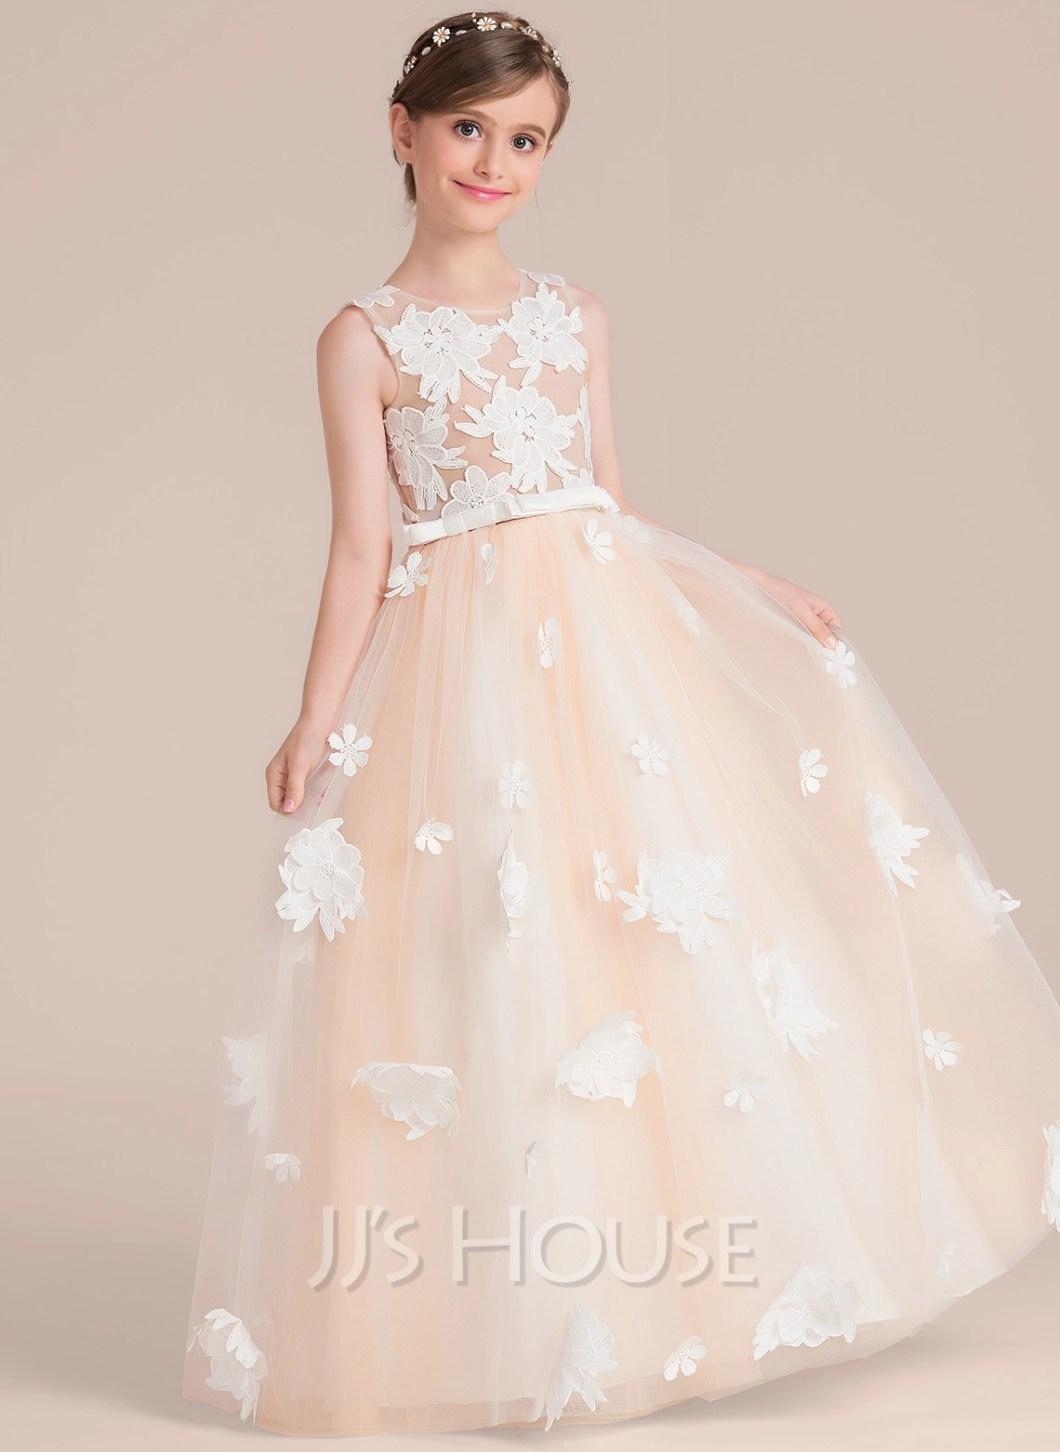 883ef1527dc ... Sleeveless Scoop Loading Zoom. Ball Gown Floor Length Flower Girl Dress  Satin Tulle Lace